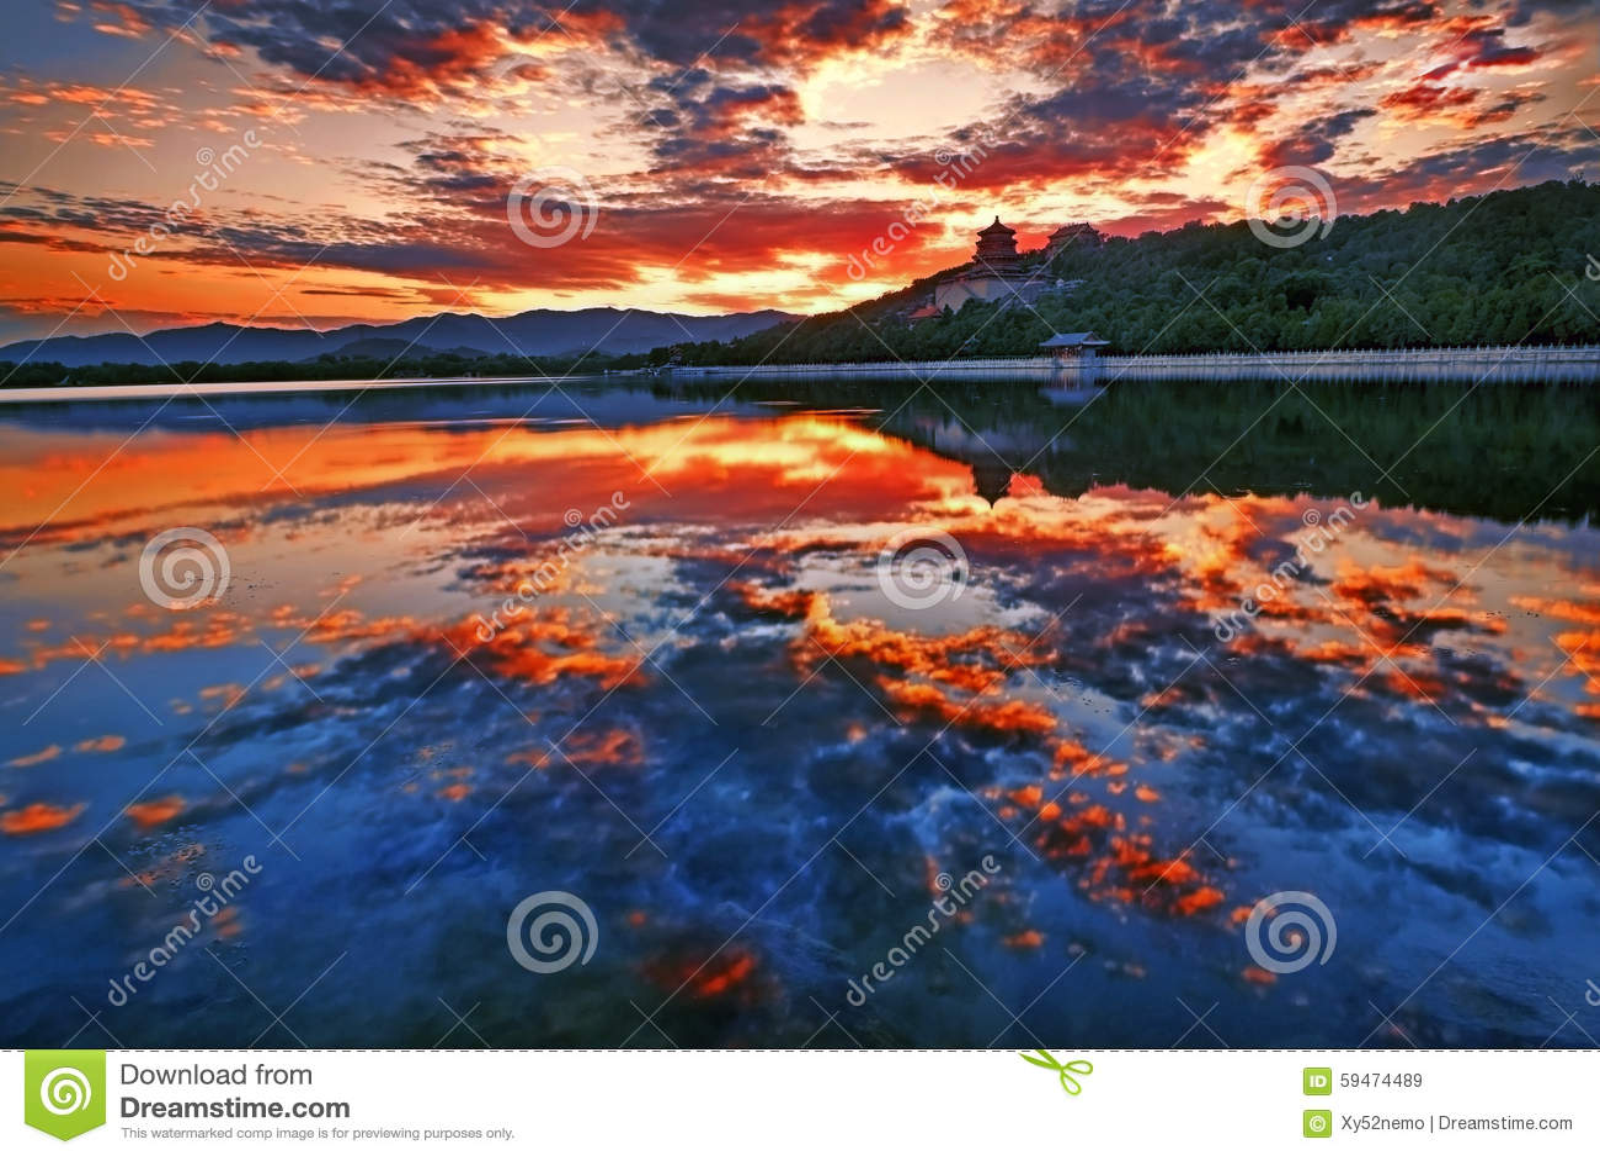 Kunming lake sunset, Summer palace, Beijing, China